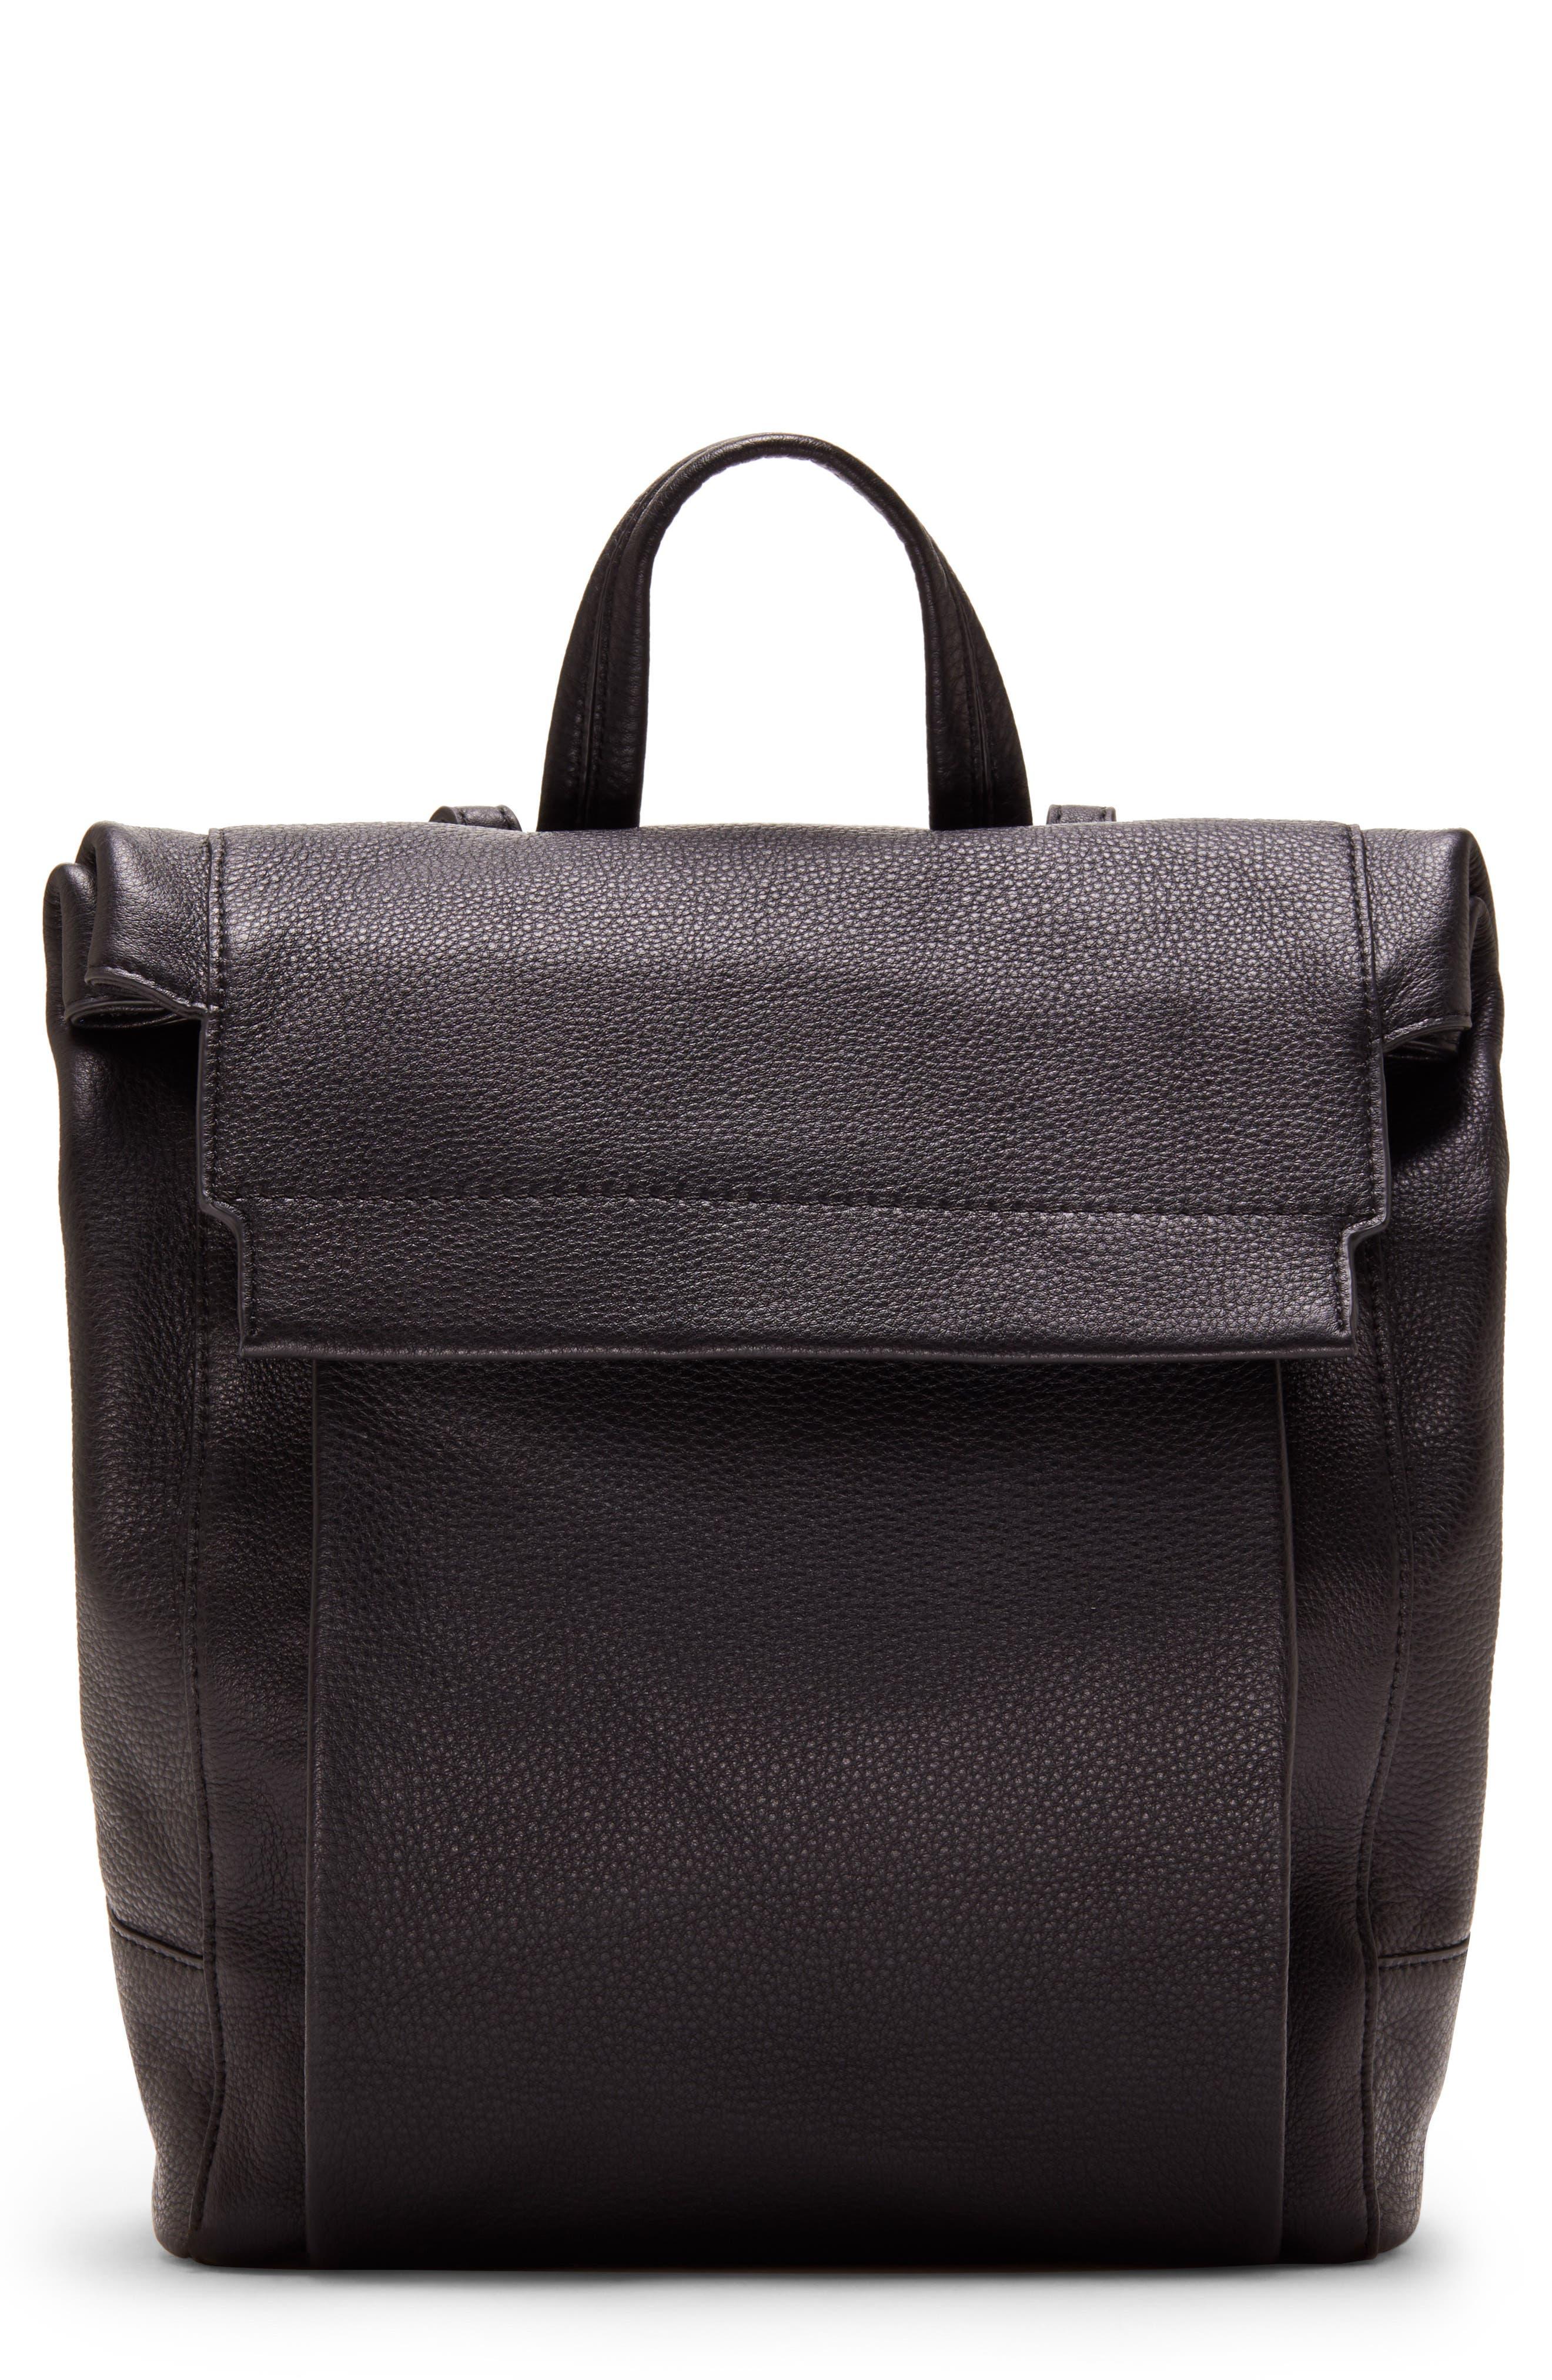 Min Pebbled Leather Backpack,                             Main thumbnail 1, color,                             BLACK